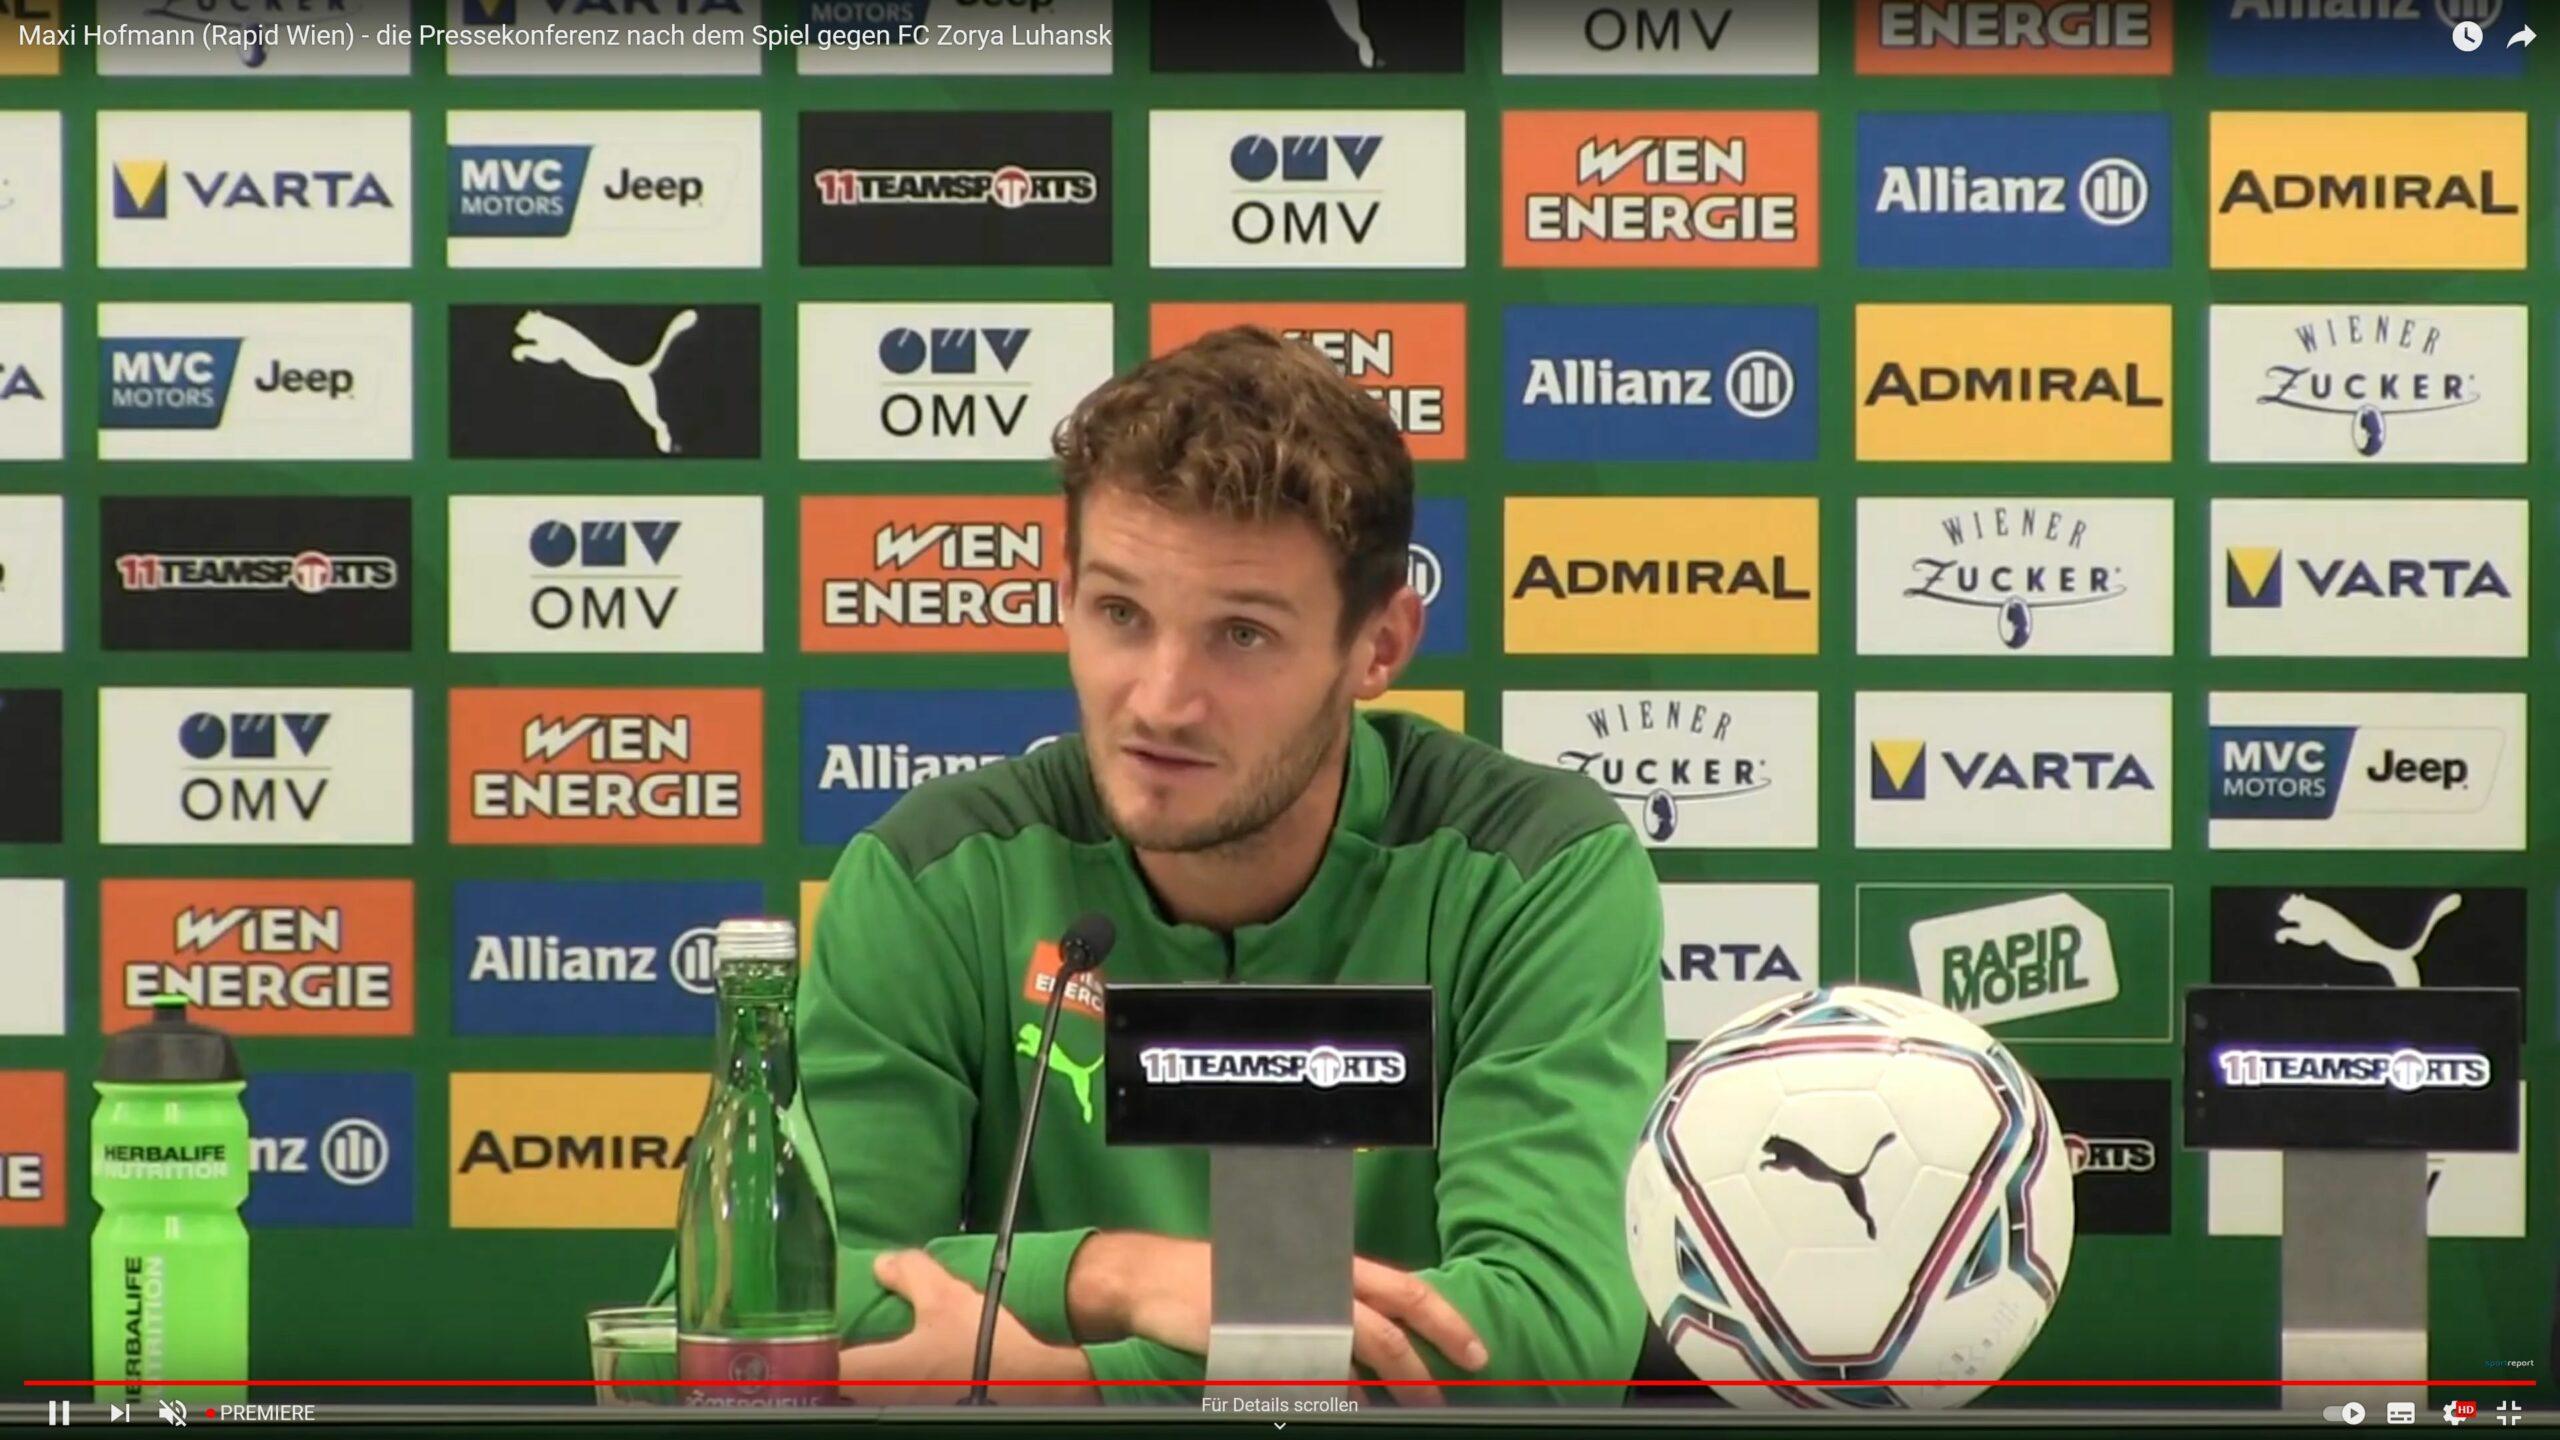 Video: Maxi Hofmann (Trainer SK Rapid Wien) - die Pressekonferenz nach dem Spiel gegen Sorja Luhansk